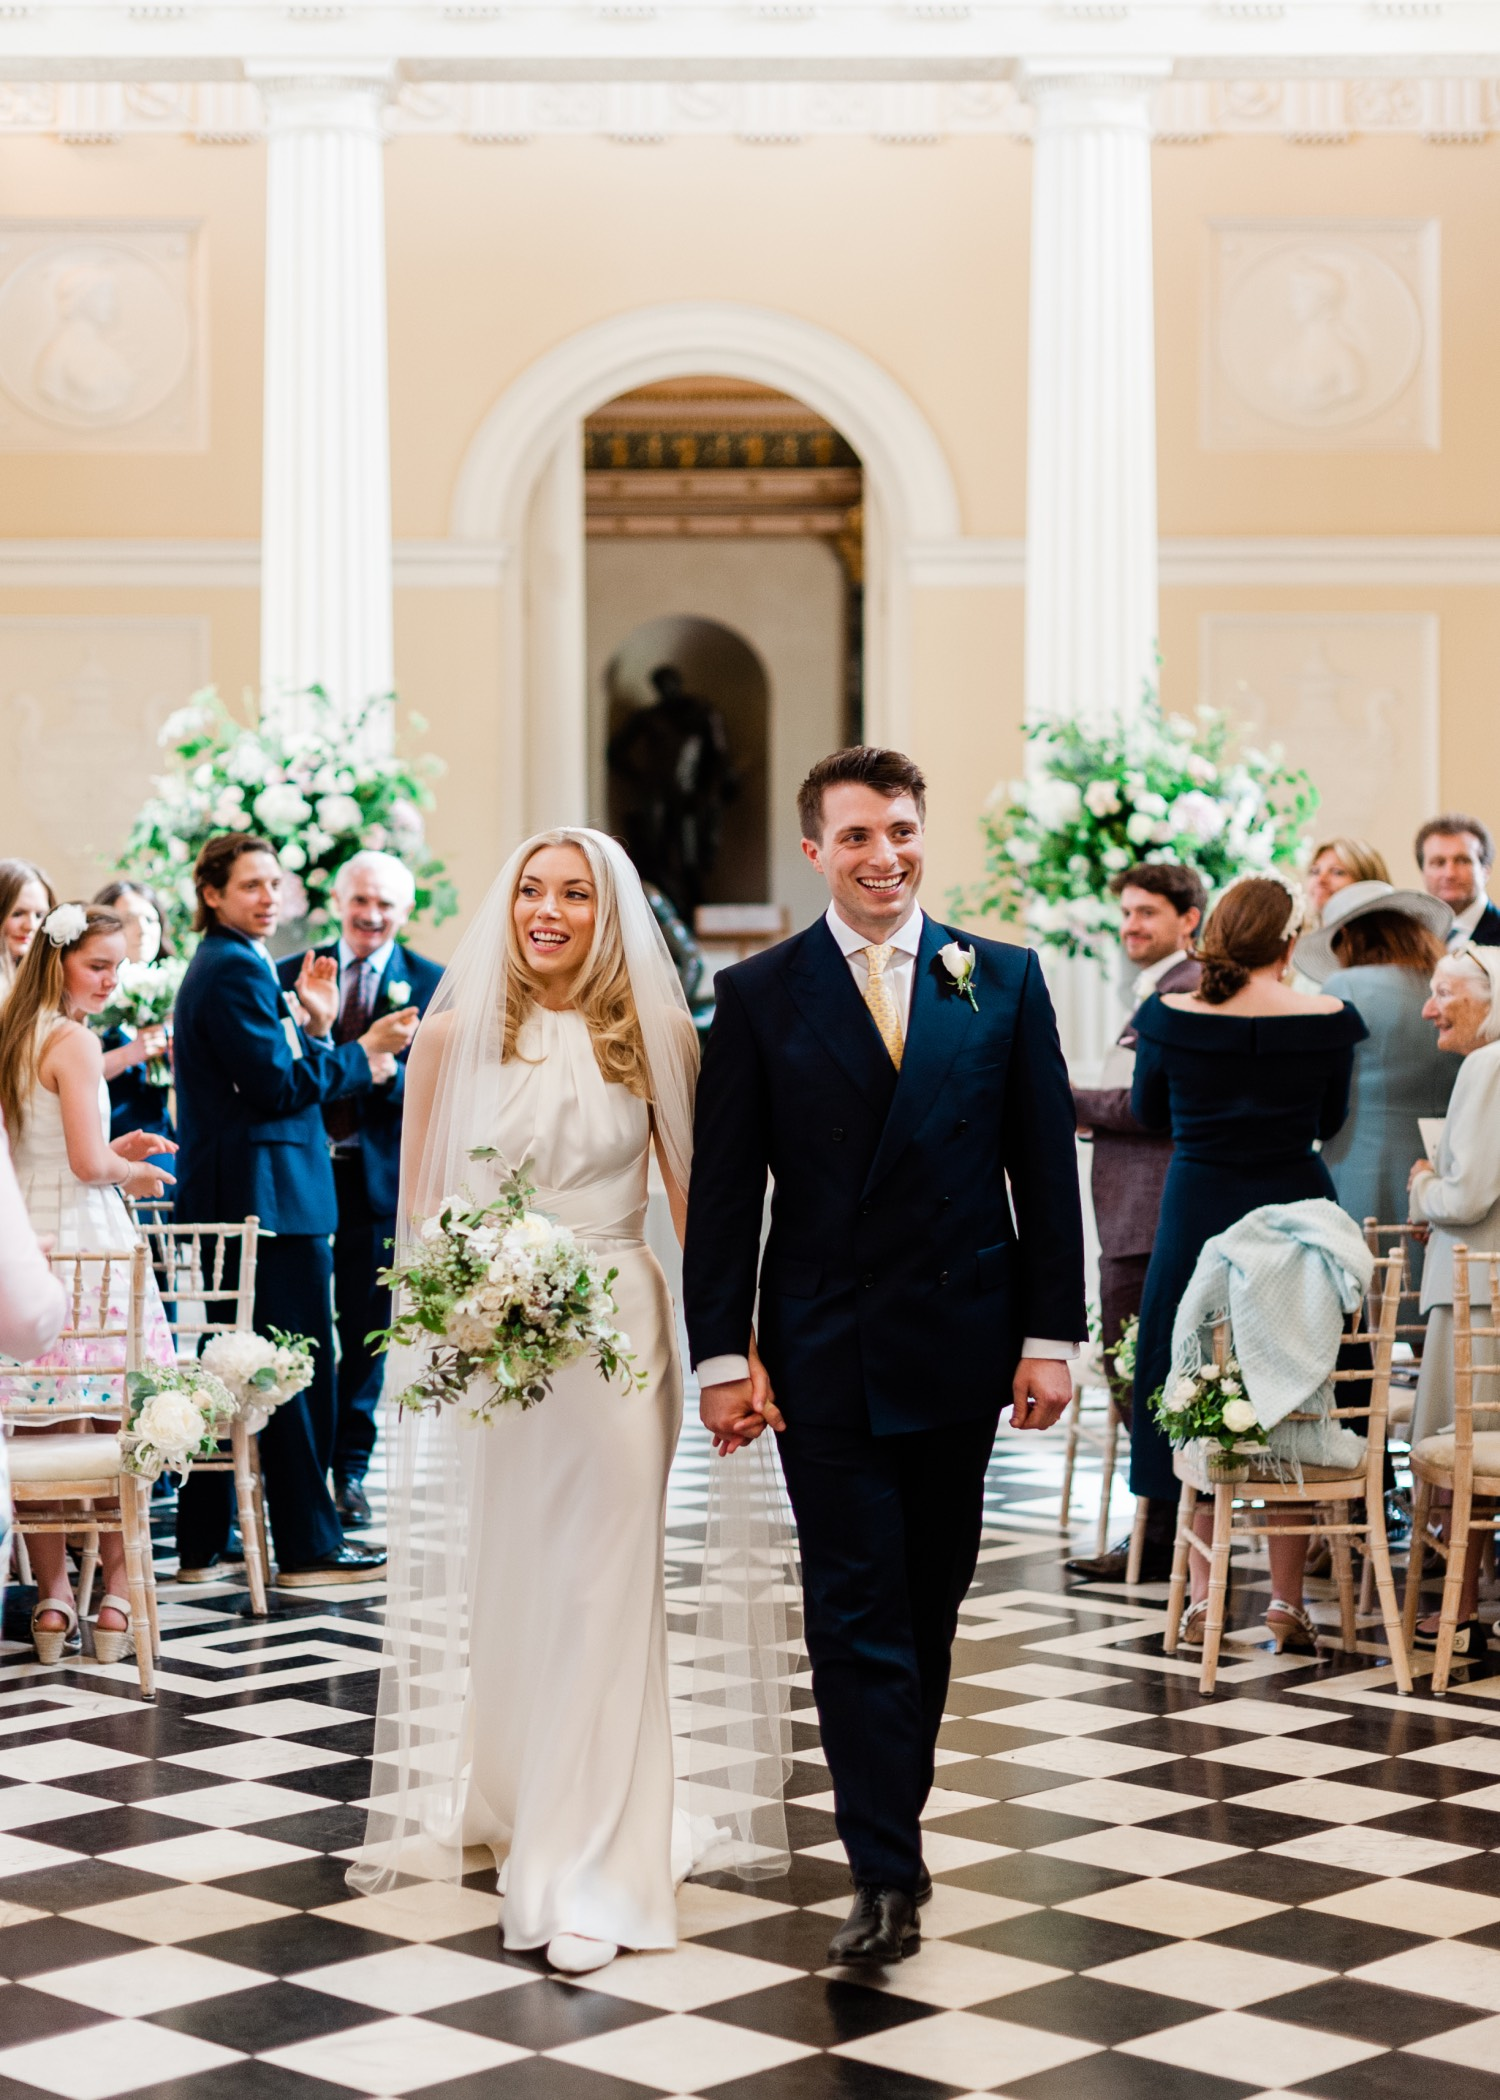 Littleton-Rose-Syon-House-London-Wedding-Planner-Cathy-and-Val.jpg